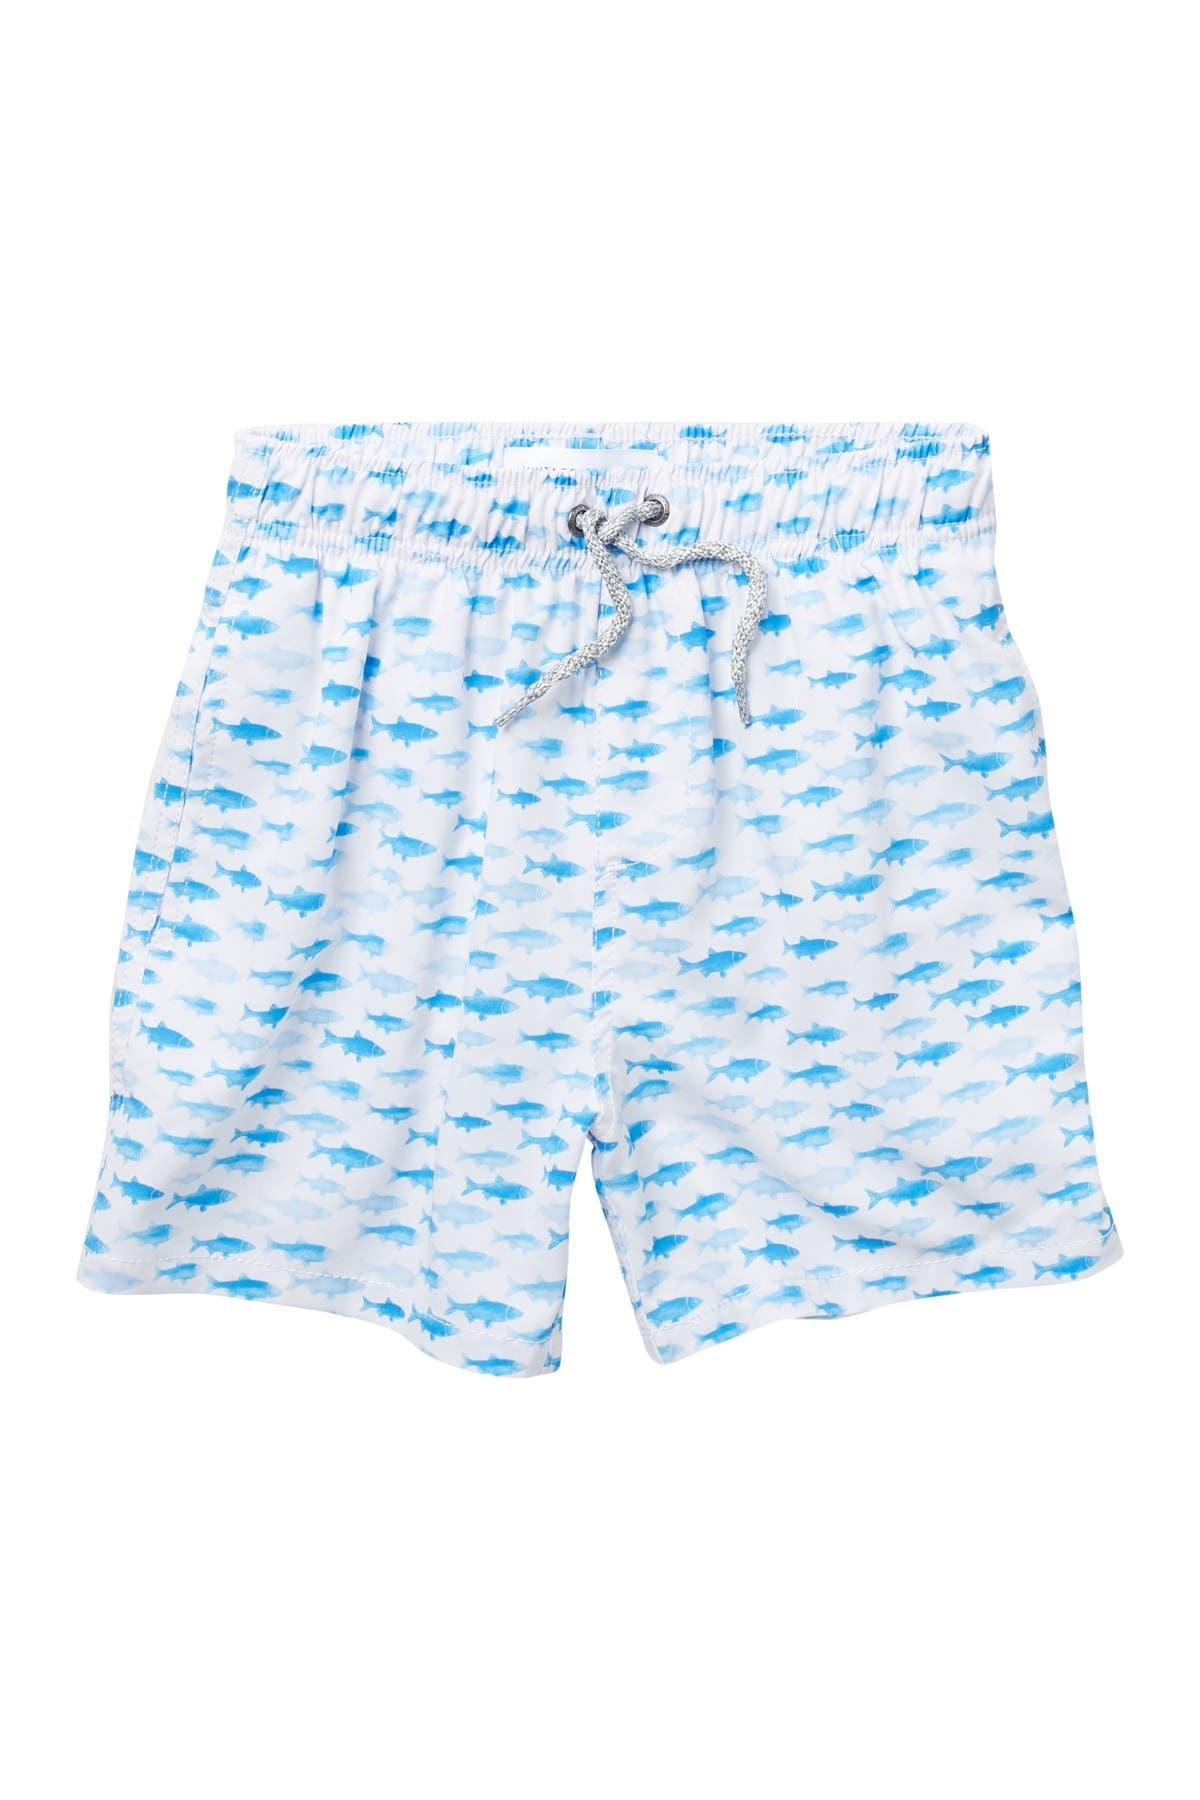 Image of Vintage Summer Printed Drawstring Swim Shorts